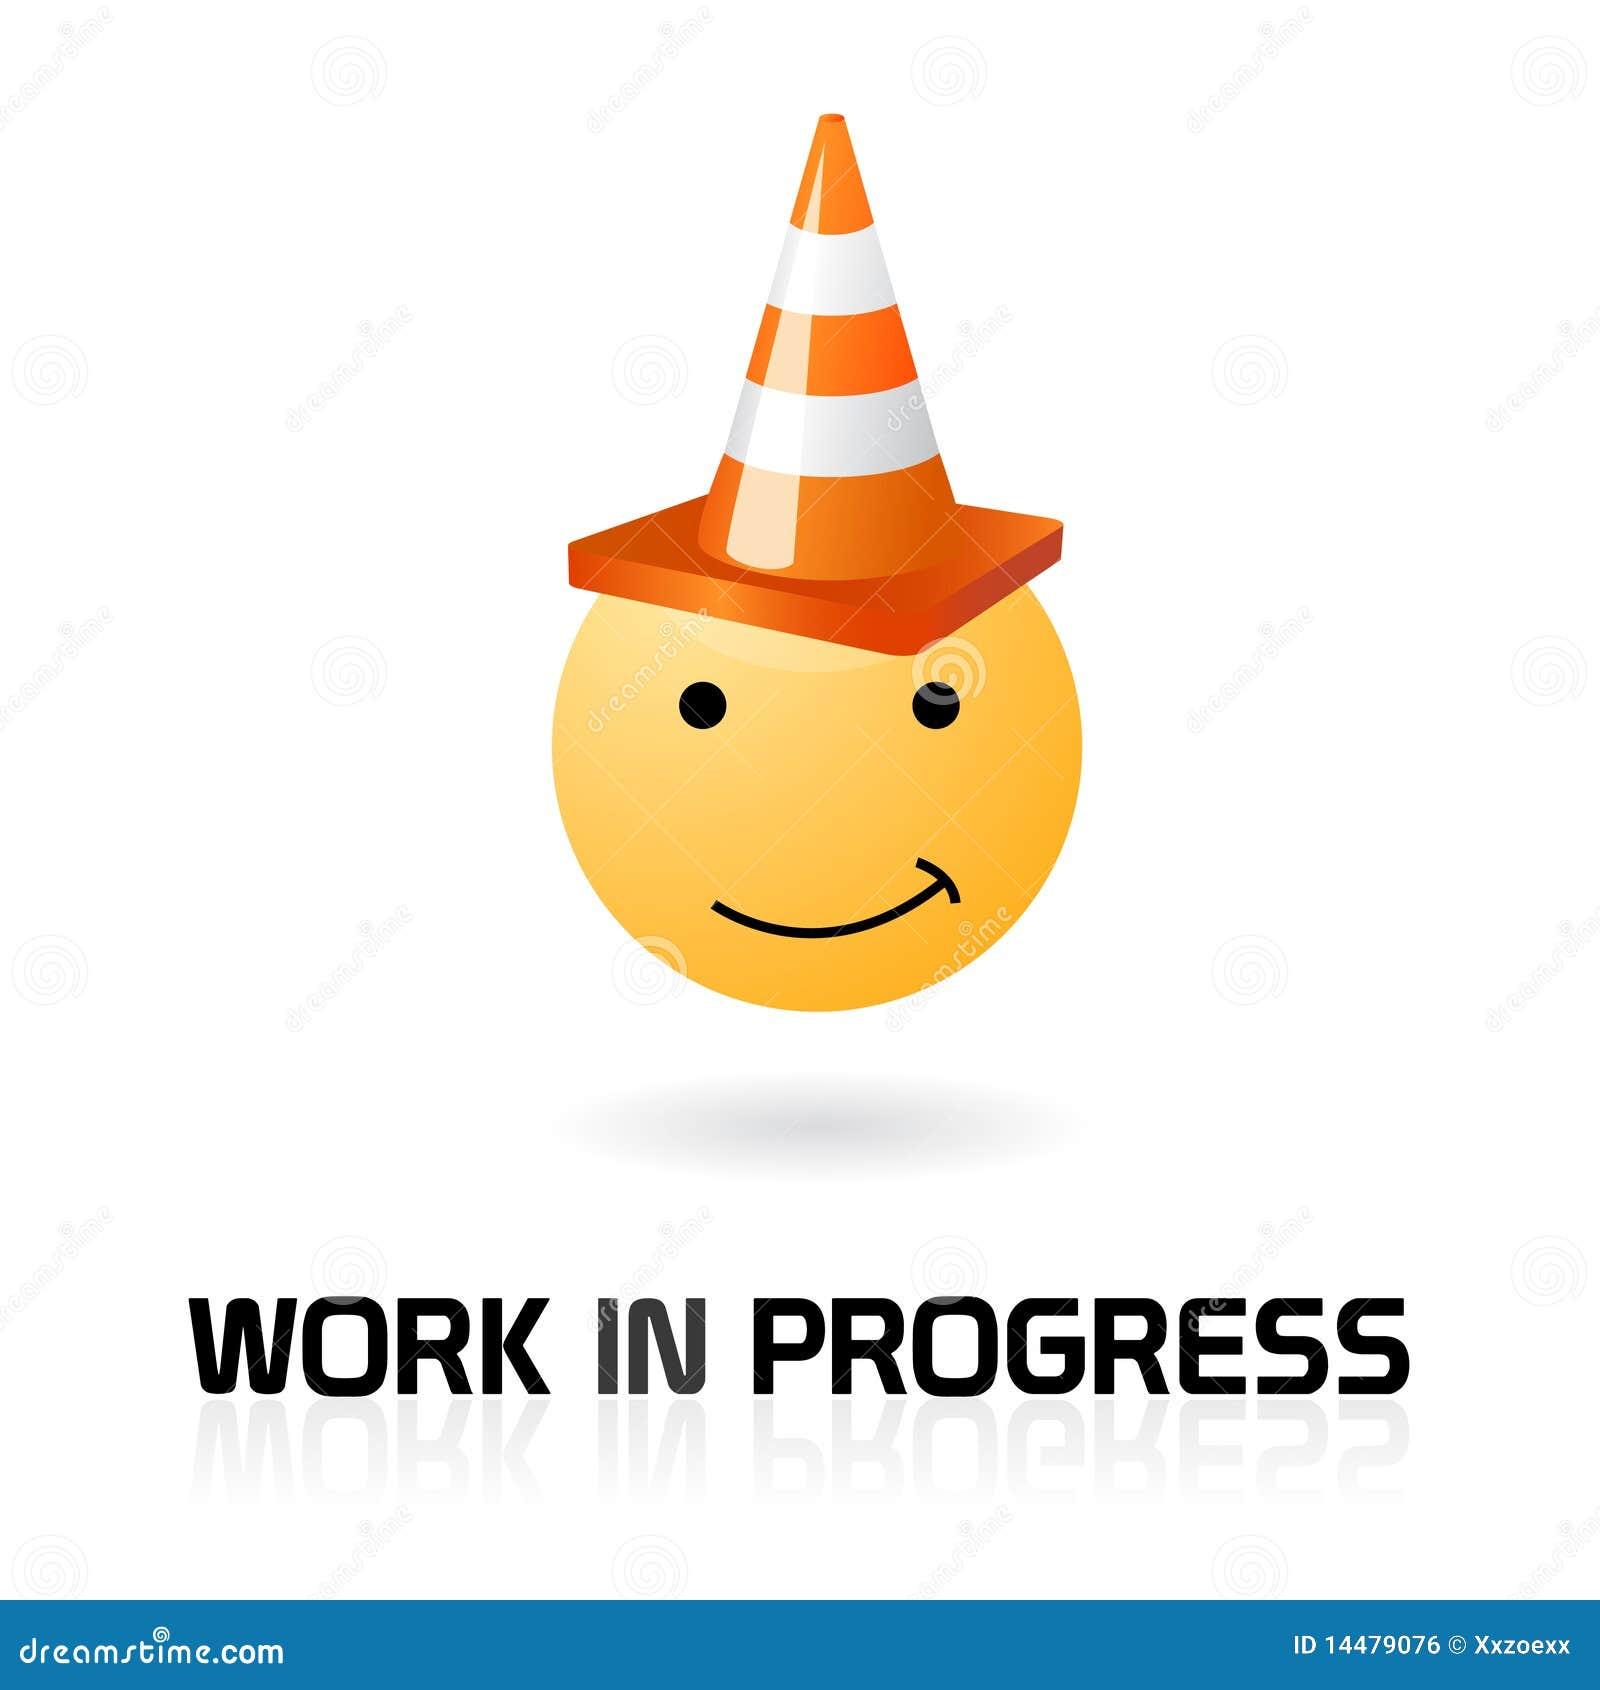 Work in progress funny symbol stock vector illustration of work in progress funny symbol biocorpaavc Images